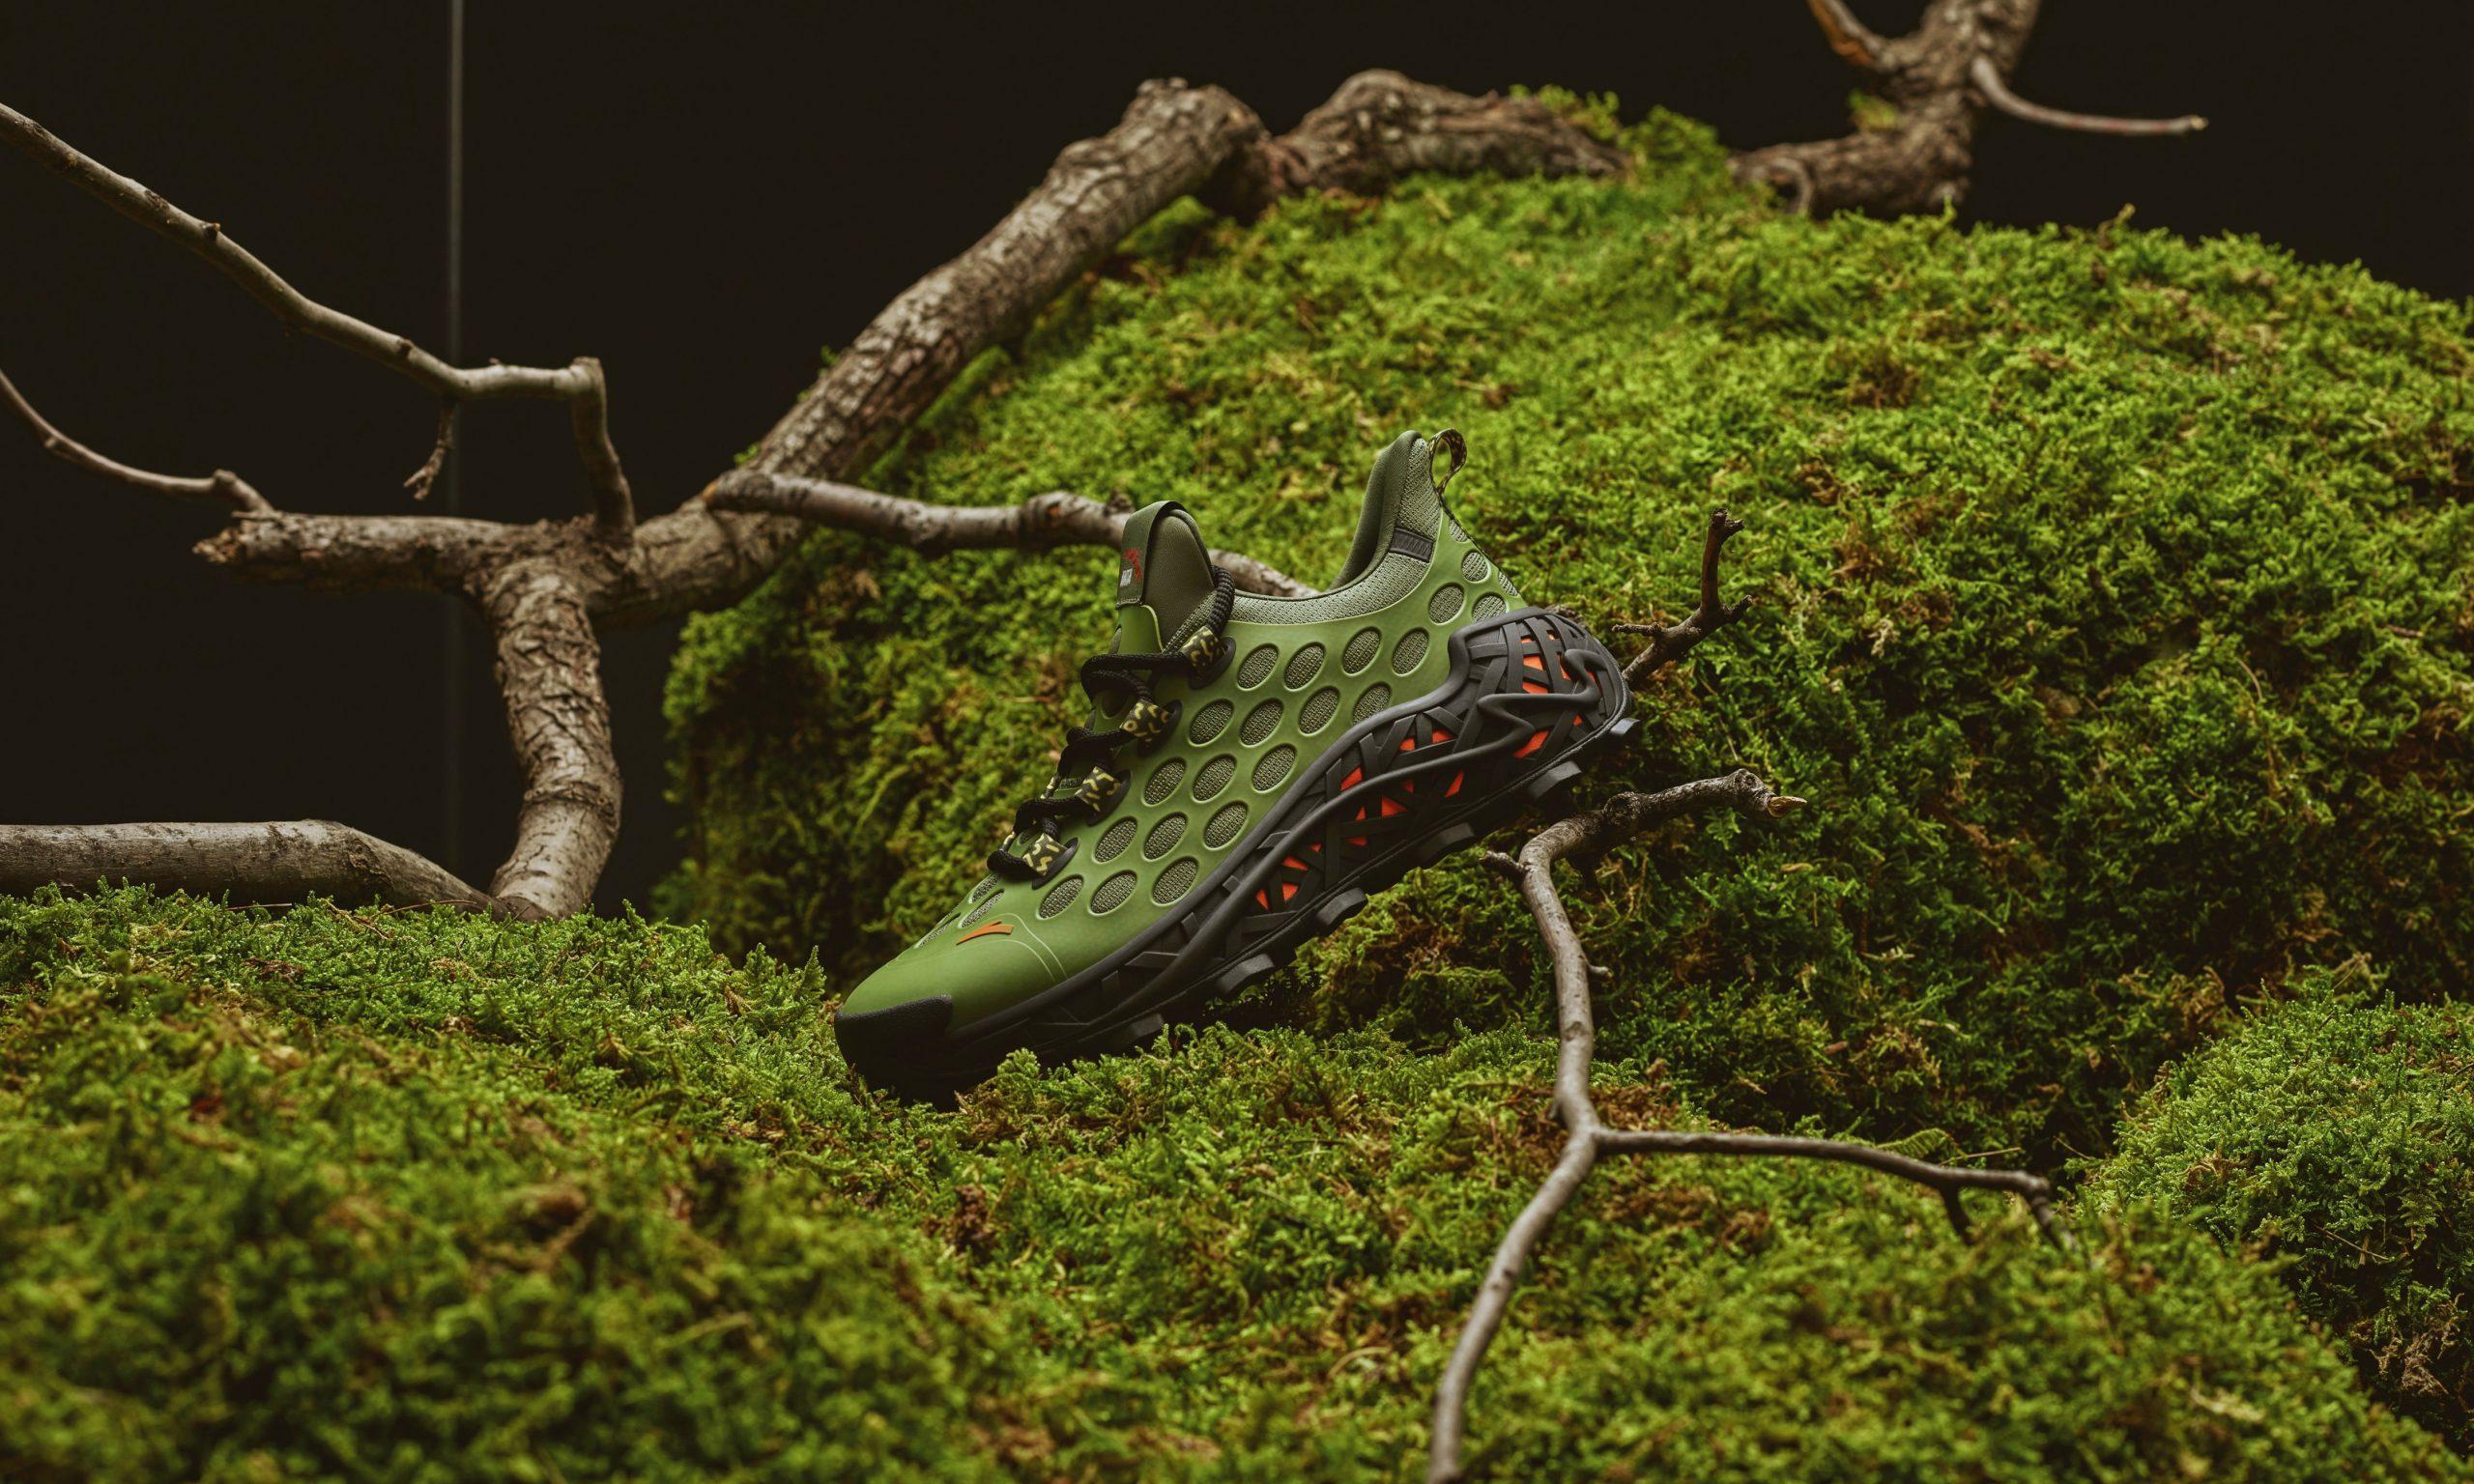 ANTA X Salehe Bembury 打造的「巢」鞋为何会引来如此大的关注?